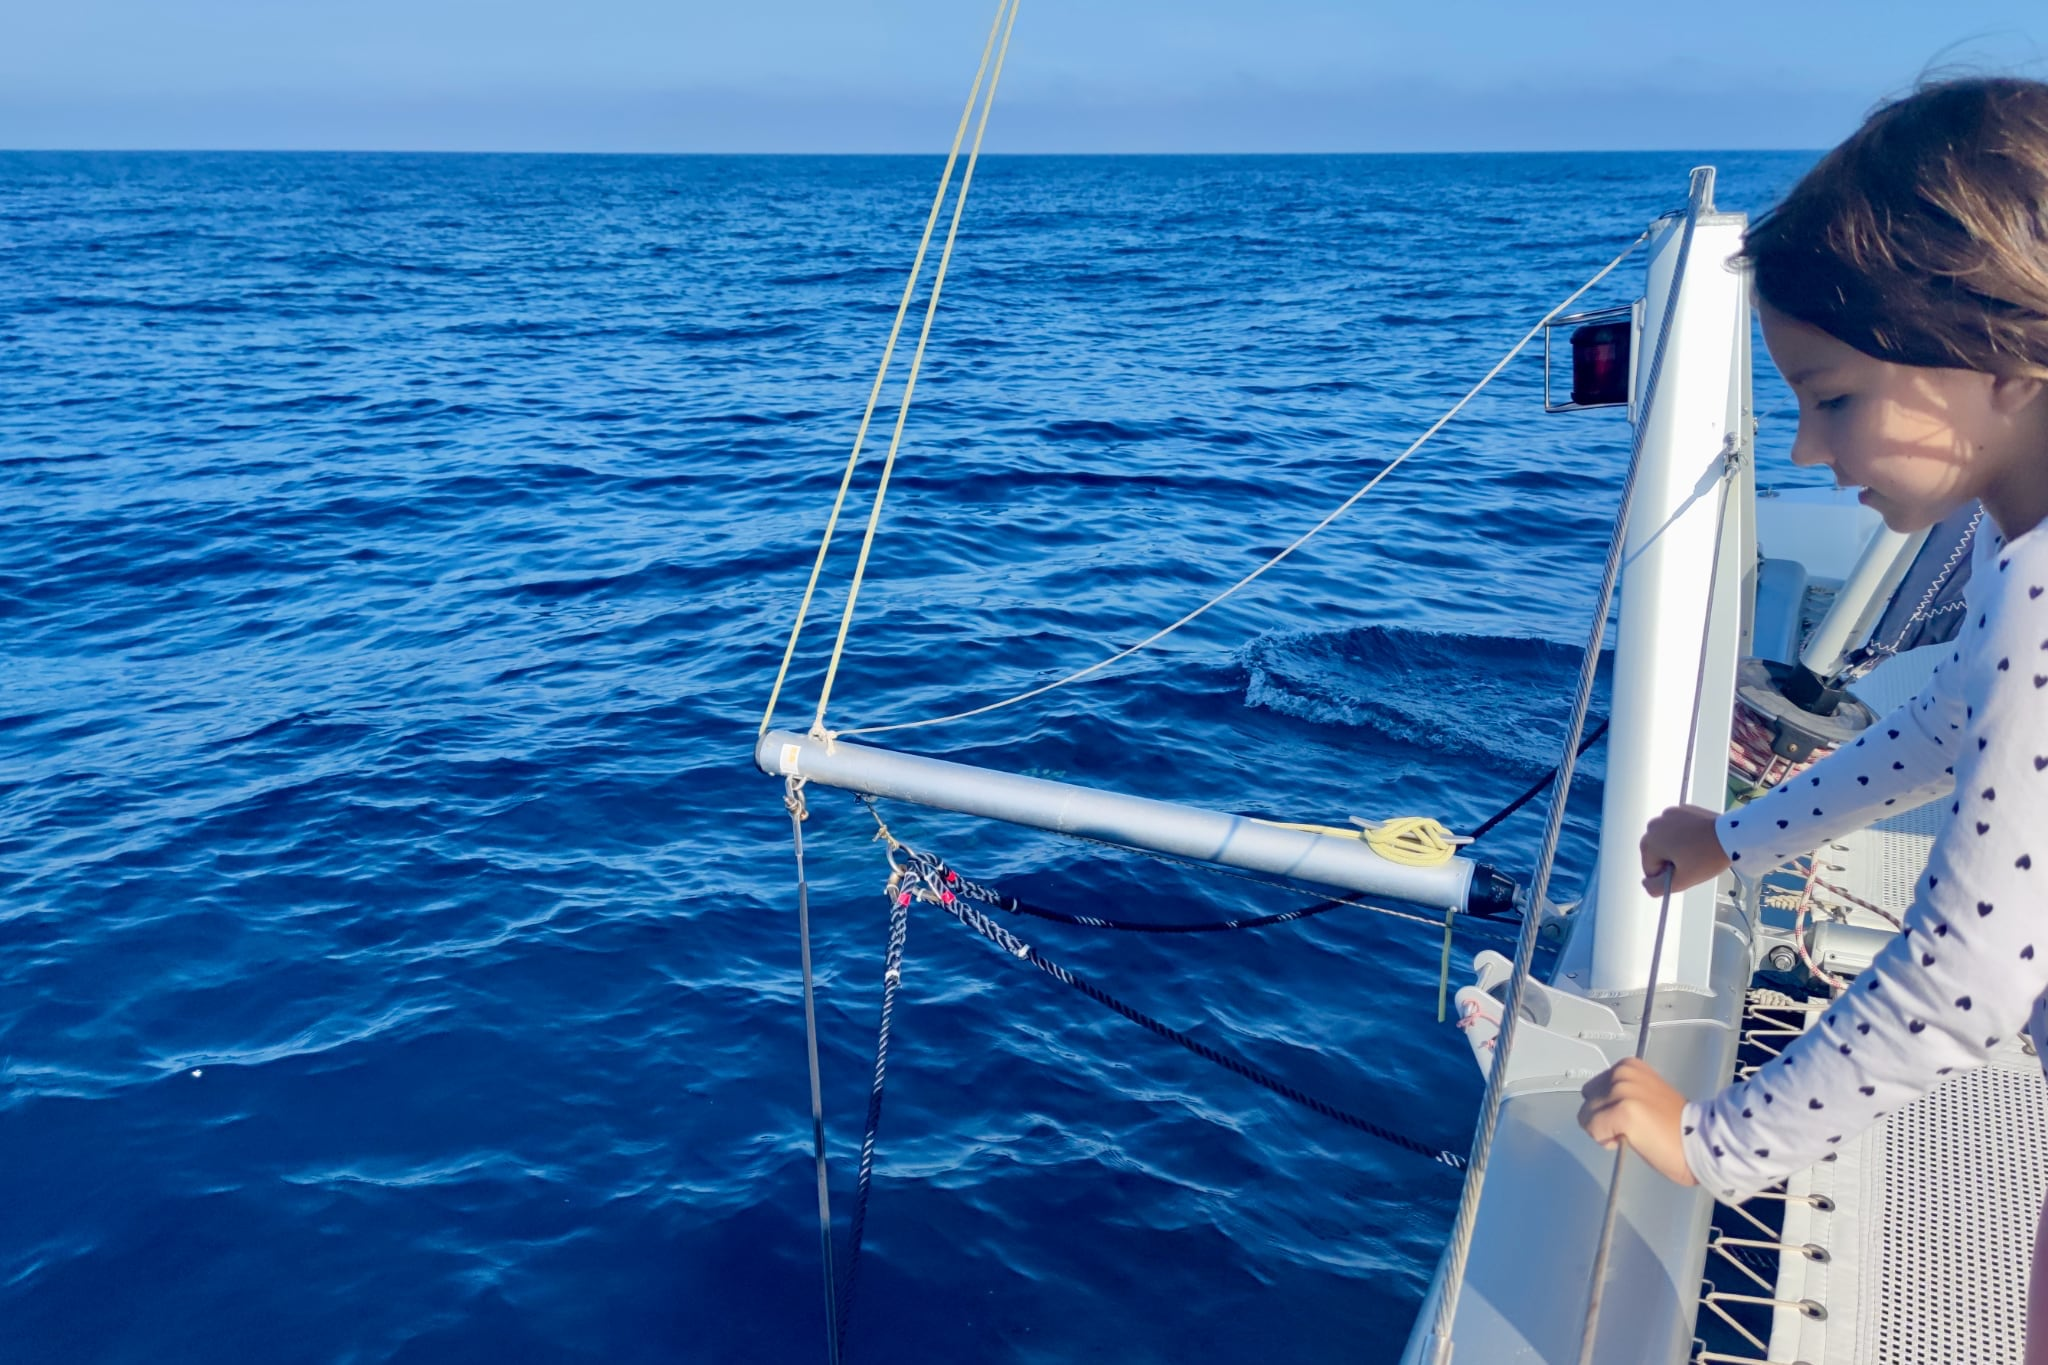 катамаран девочка синее море